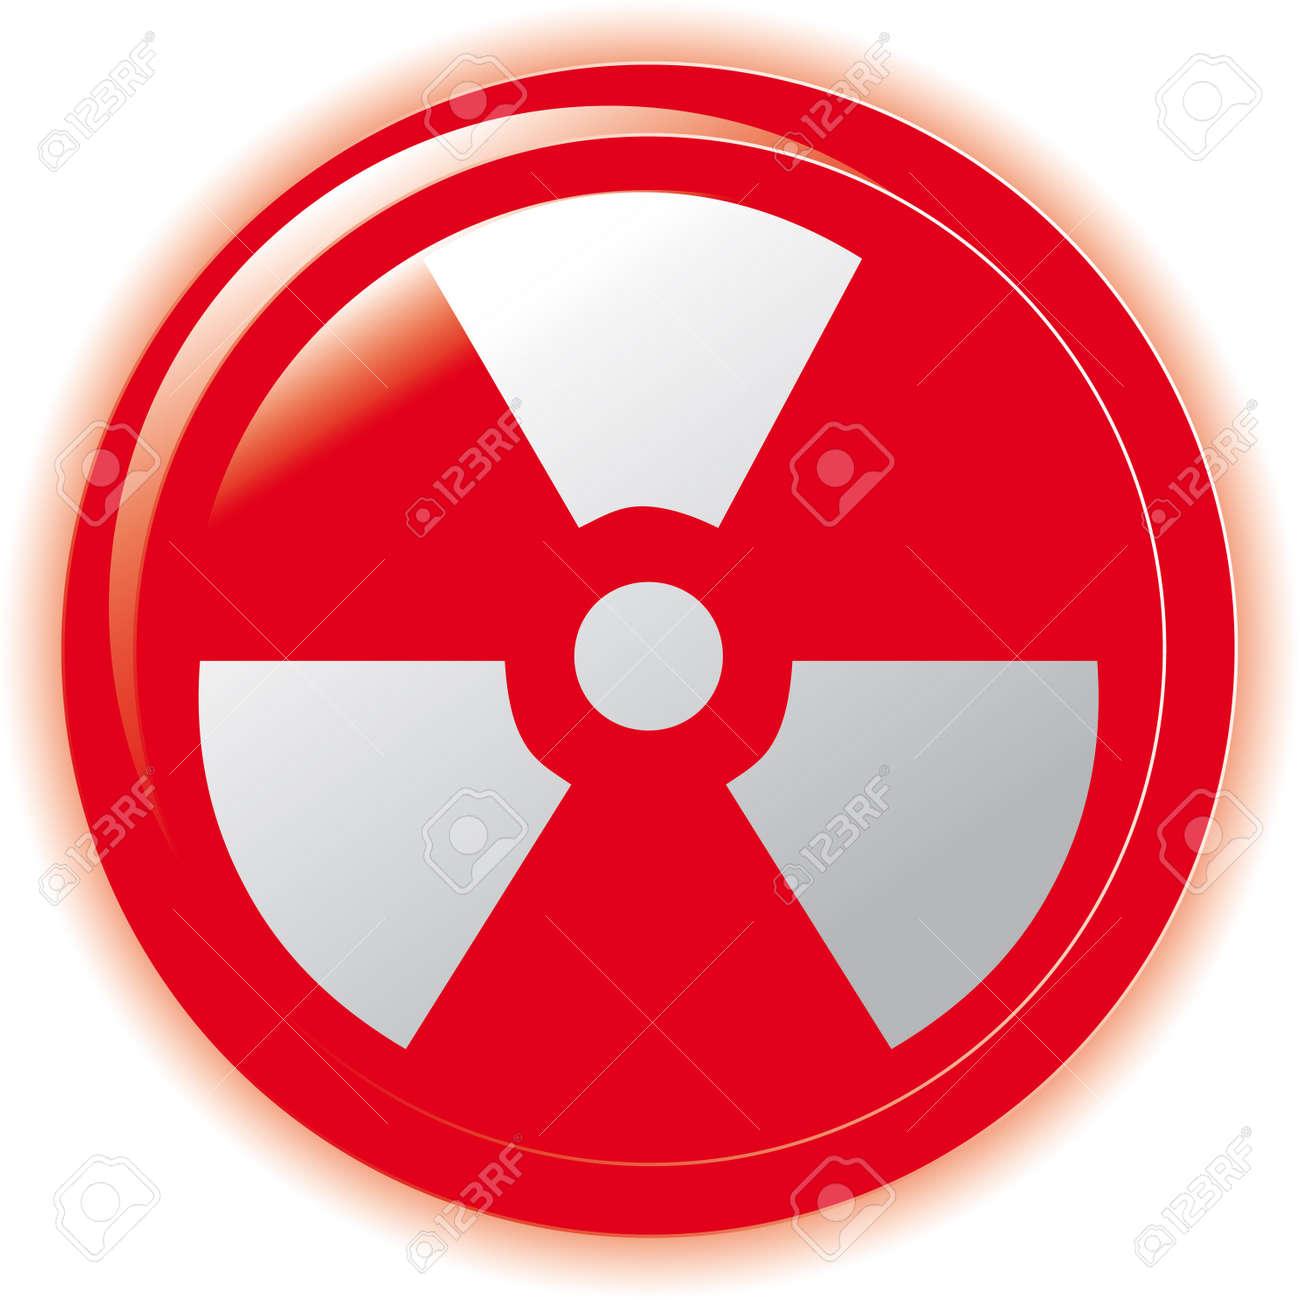 radioactive sign symbol icon Stock Vector - 7068038